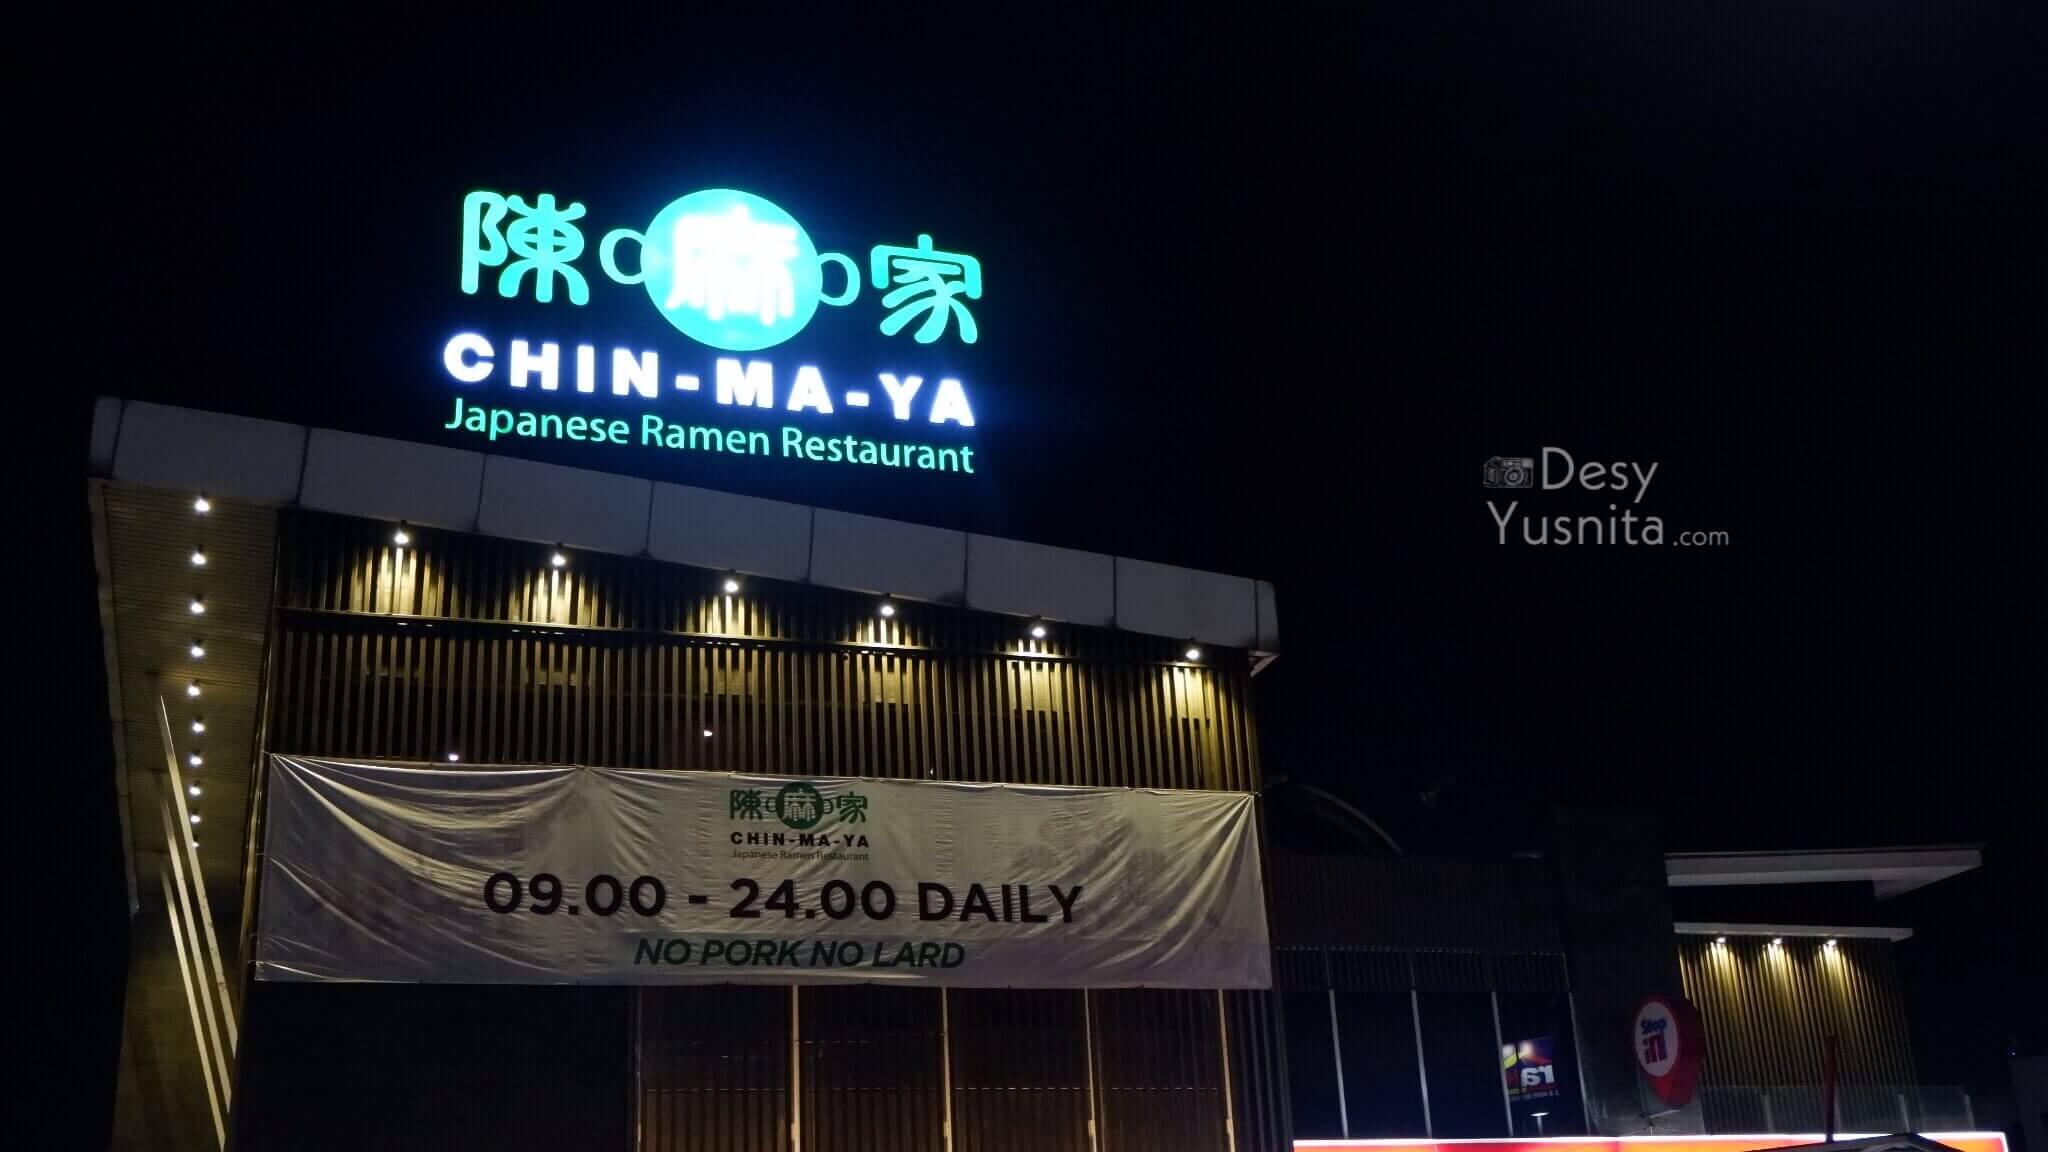 Restoran Ramen di Serpong-Chin Ma Ya Ramen Halal